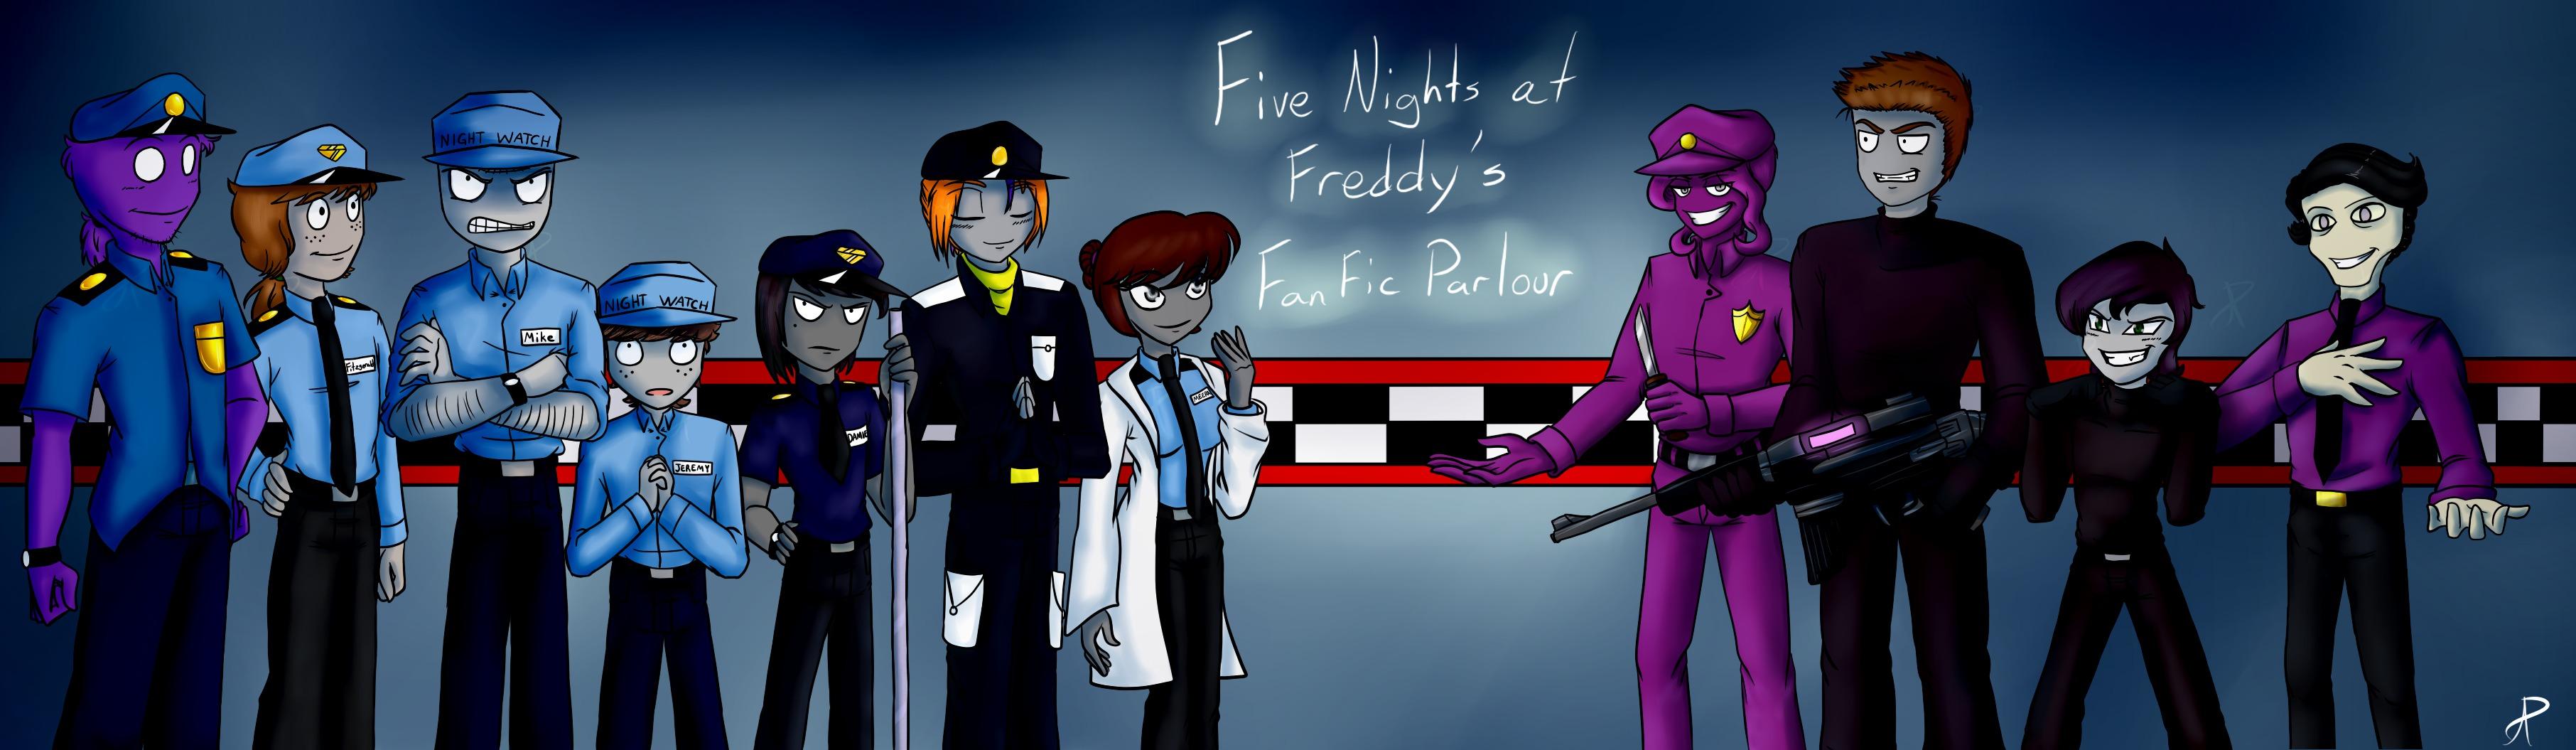 Phone Guy X Purple Guy Fanfic Lemon - Banner